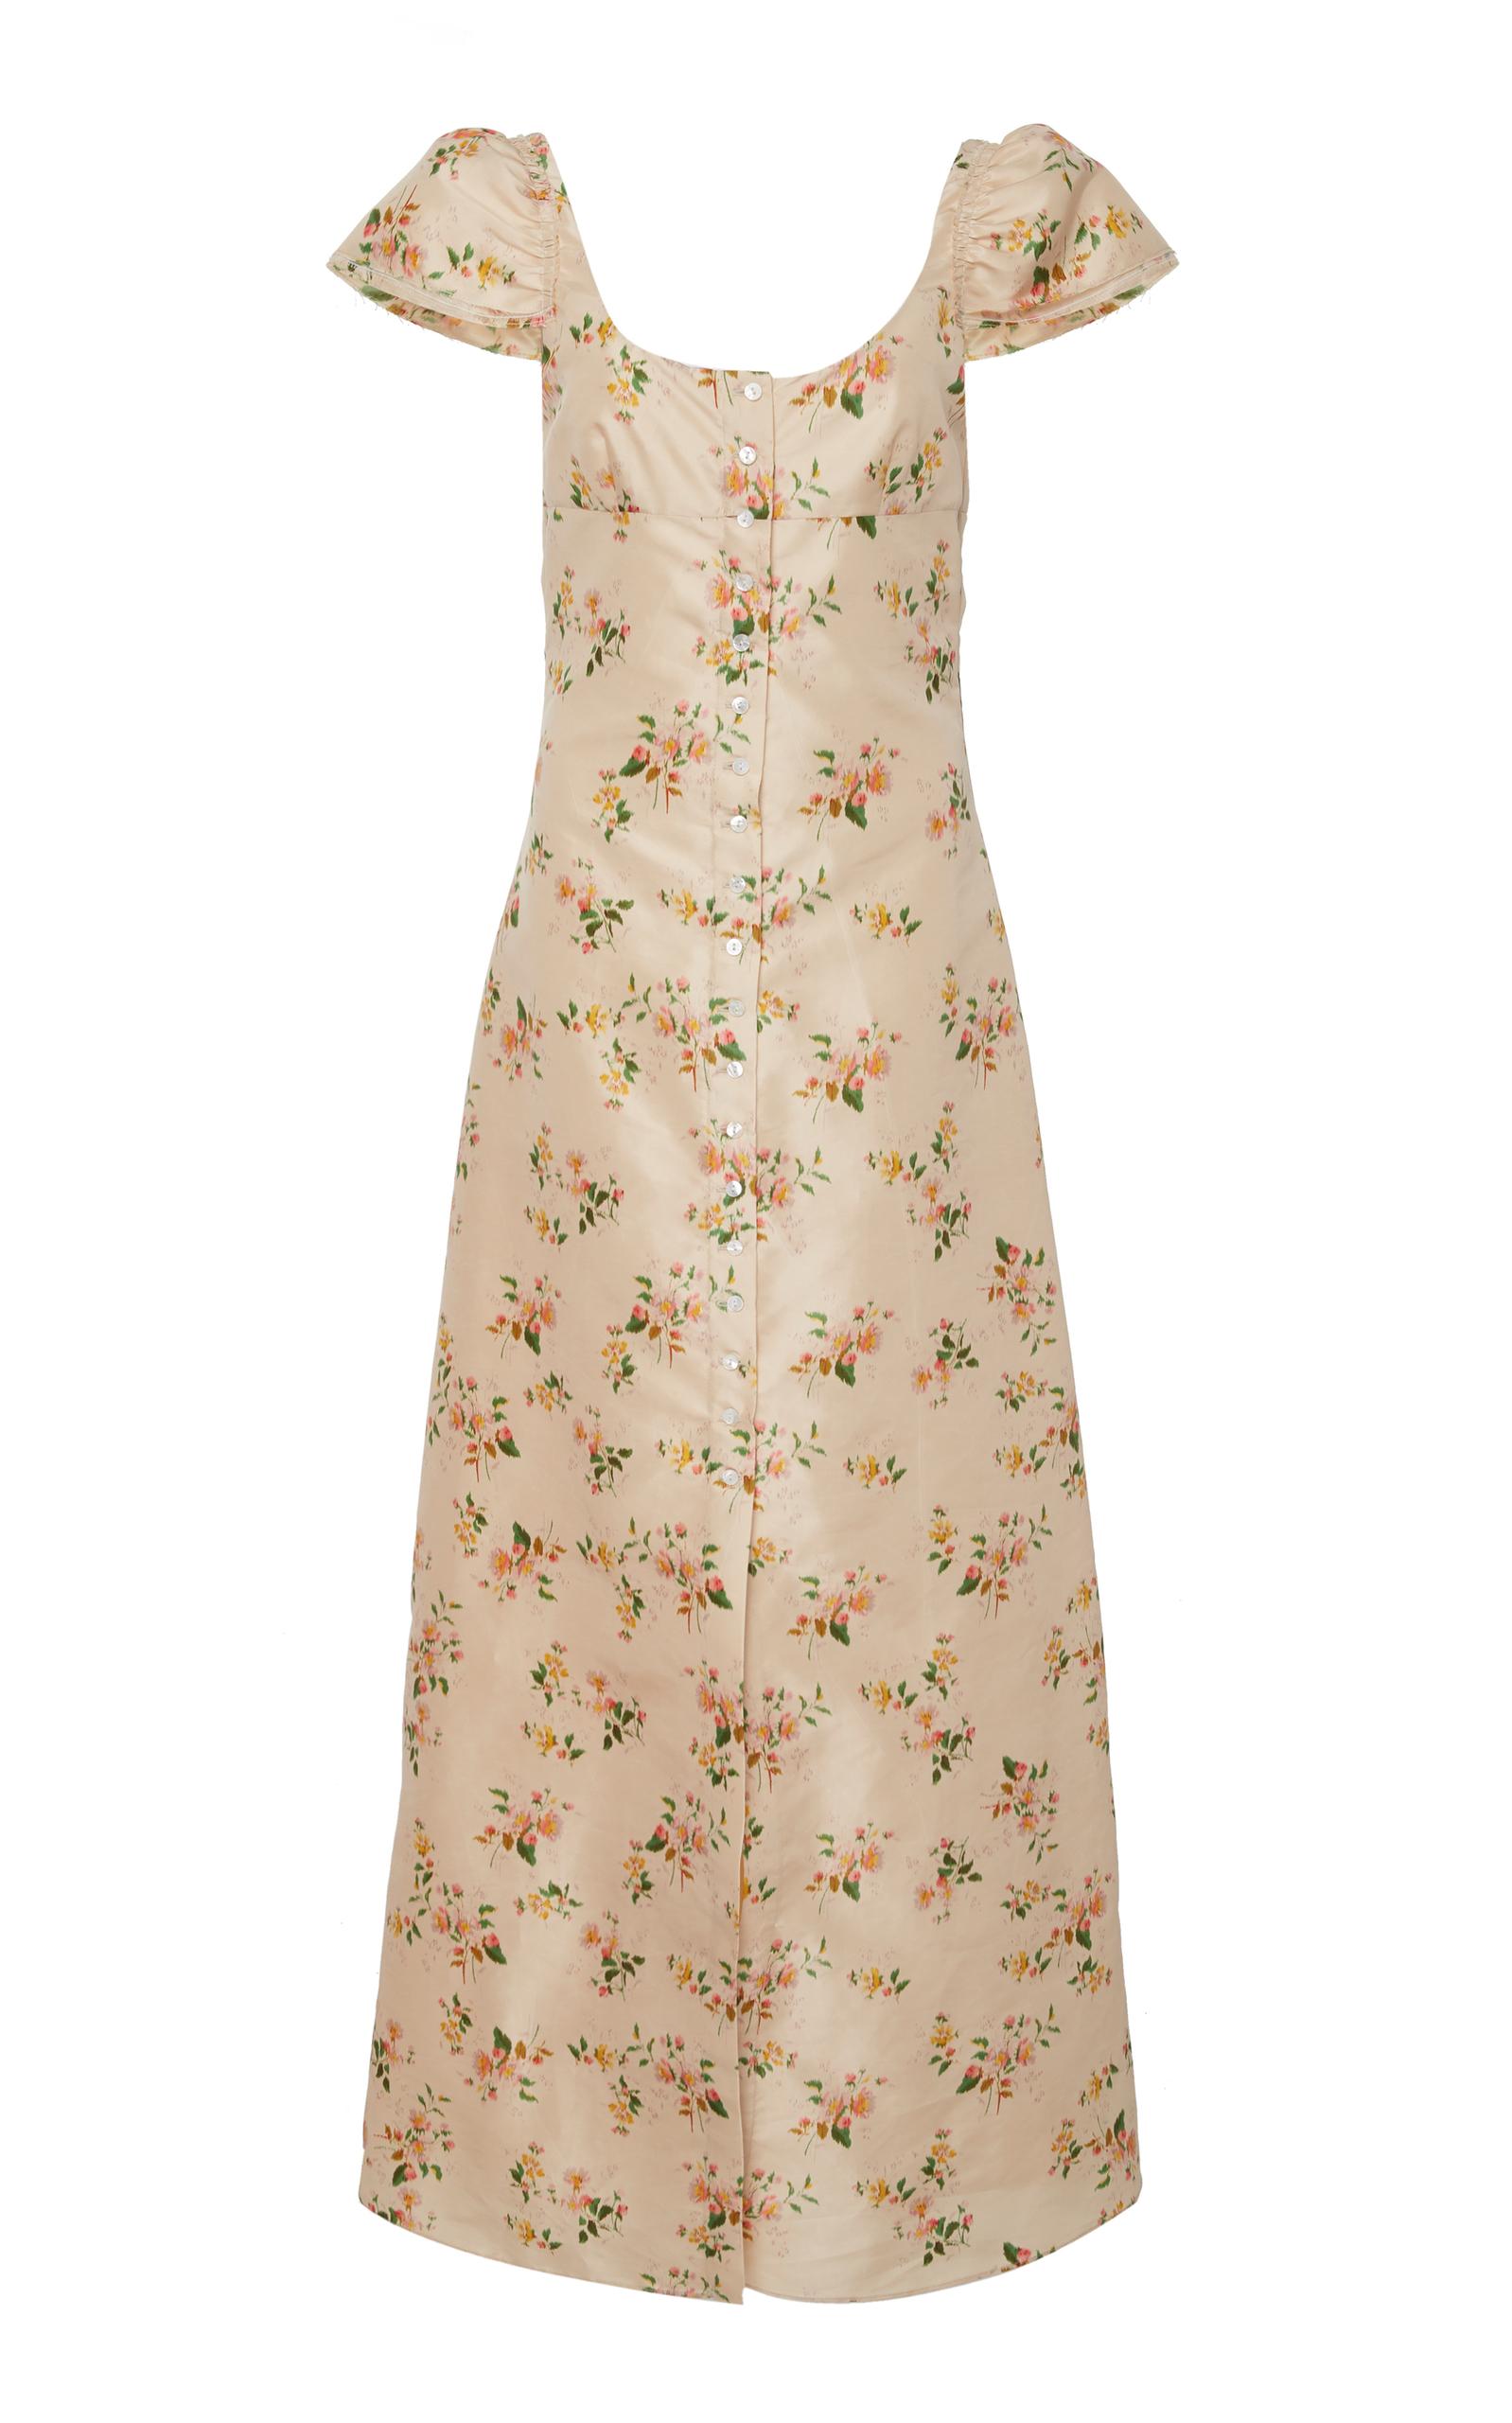 Womens Striped Open-Back Dress Brock Collection yggDnS8sJ